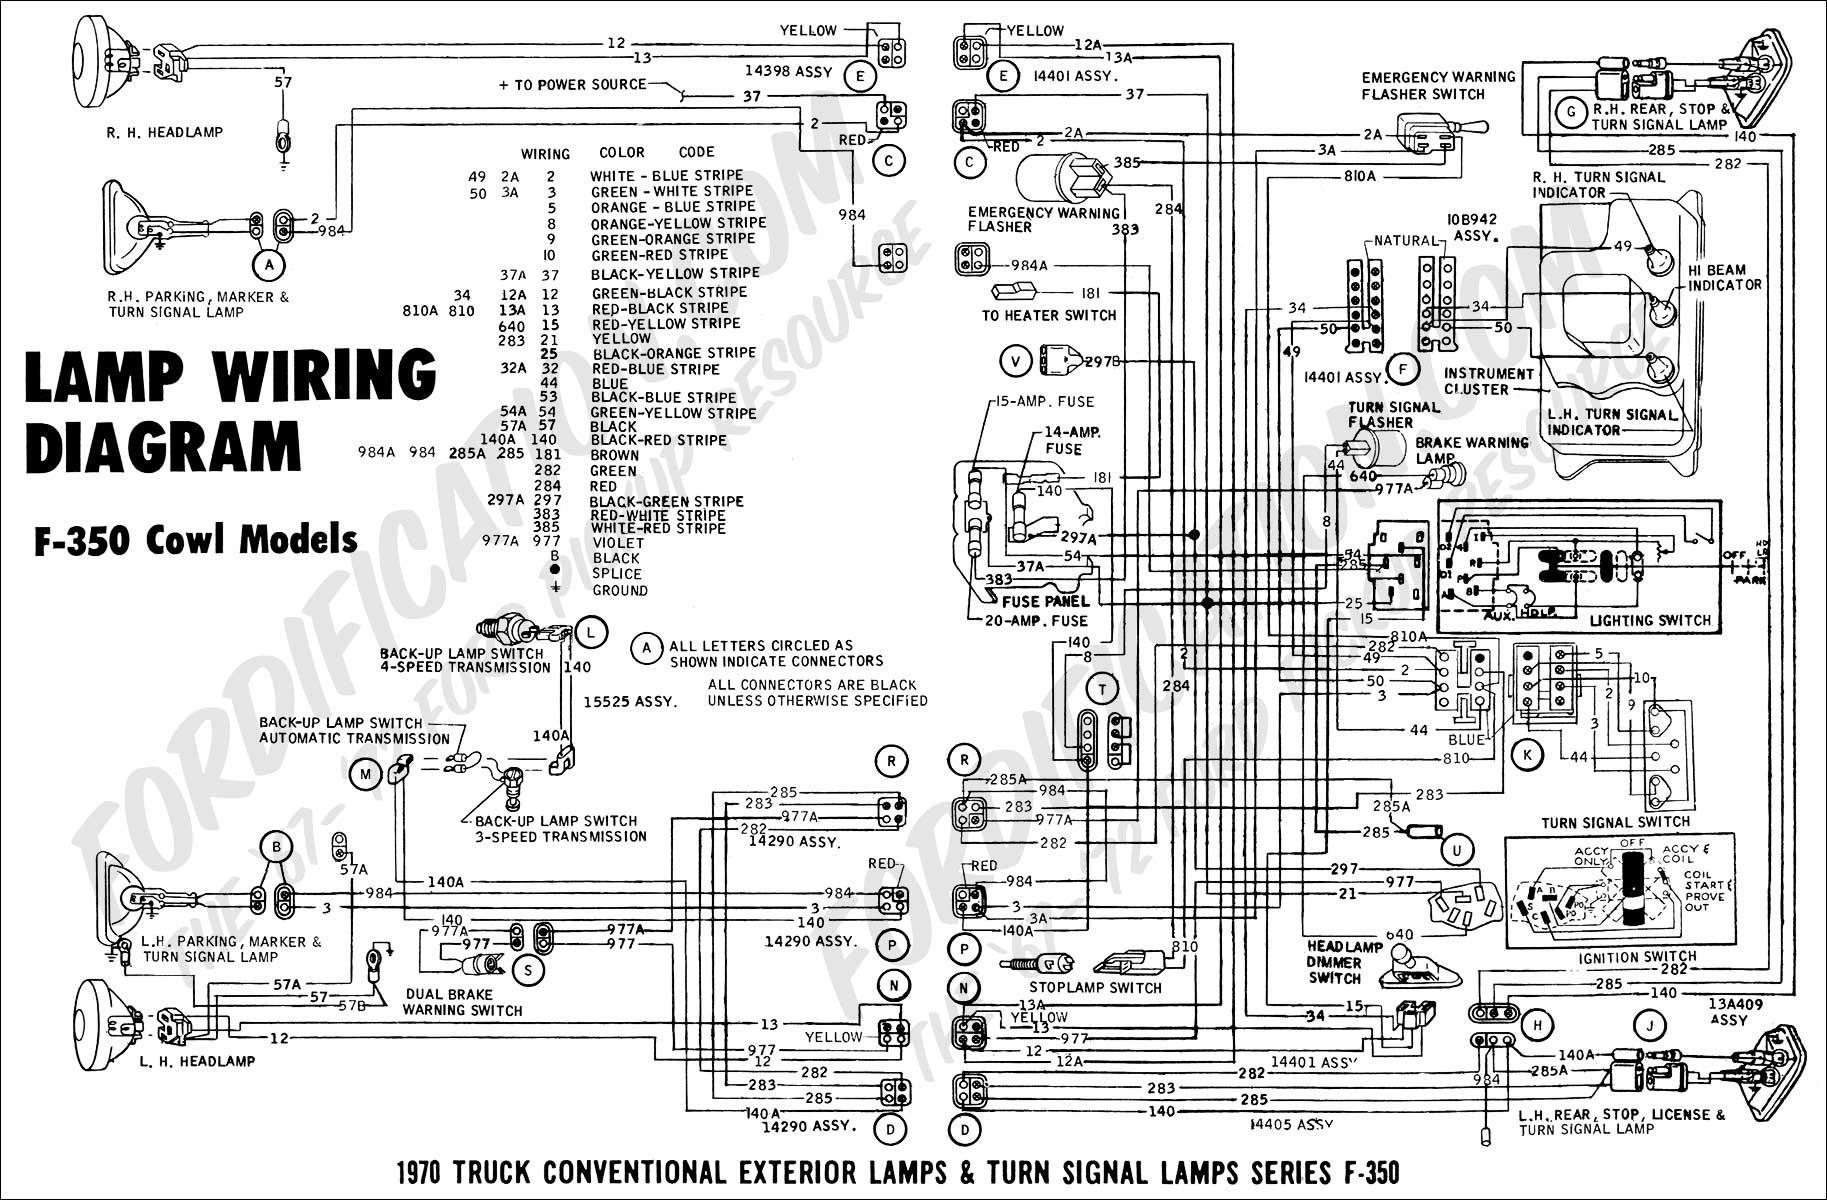 Wiring Diagrams for Trucks 1958 Gmc Truck Wiring Diagram Wiring ...